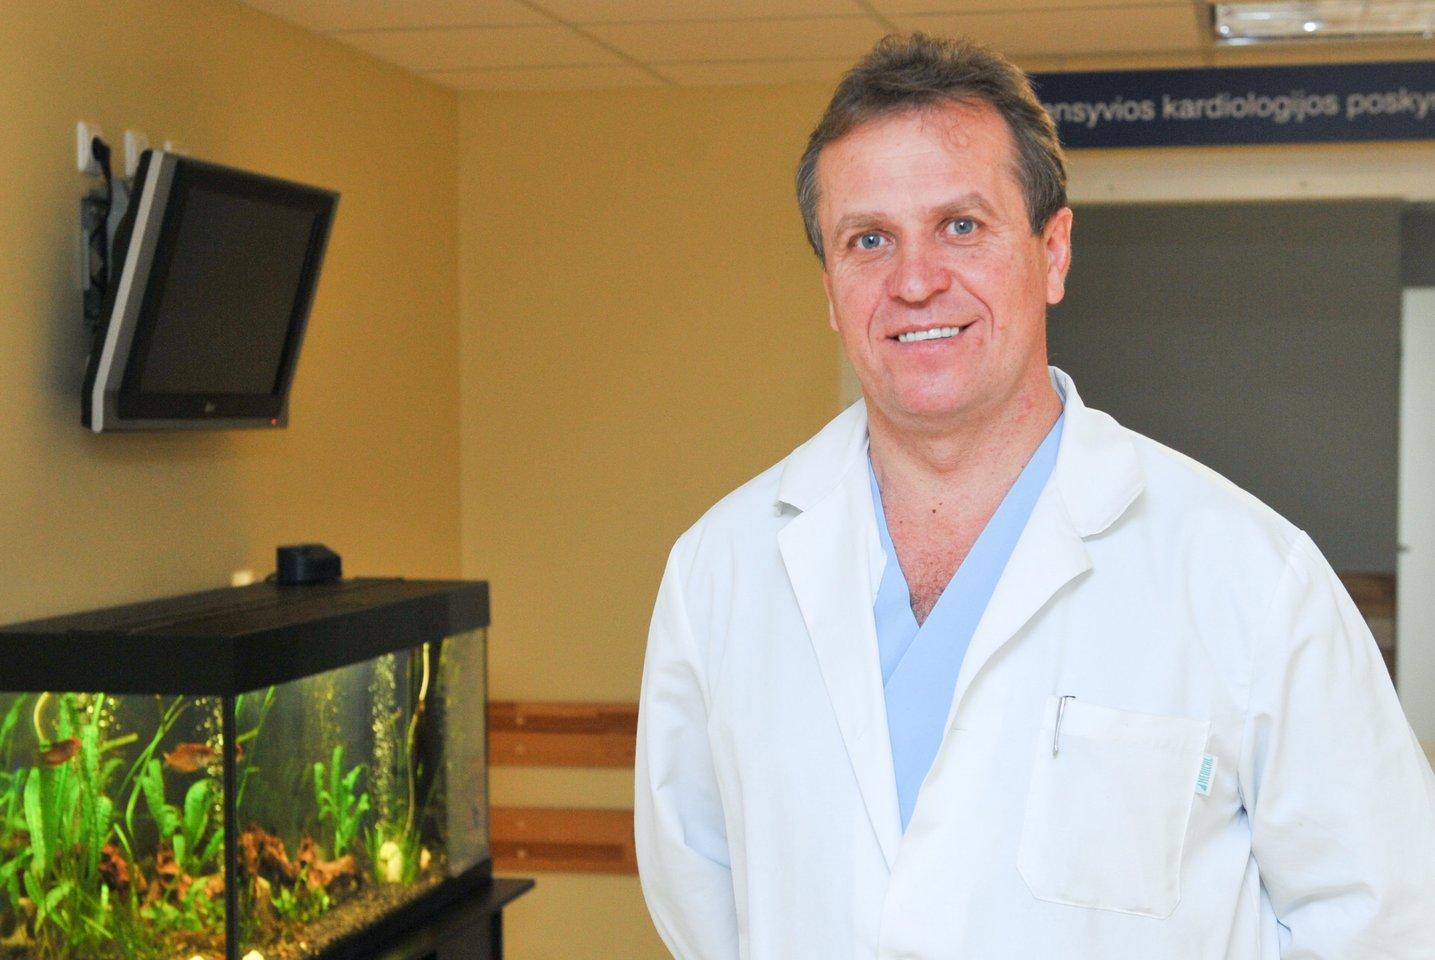 Kardiologas profesorius Pranas Šerpytis.<br>T.Bauro nuotr.